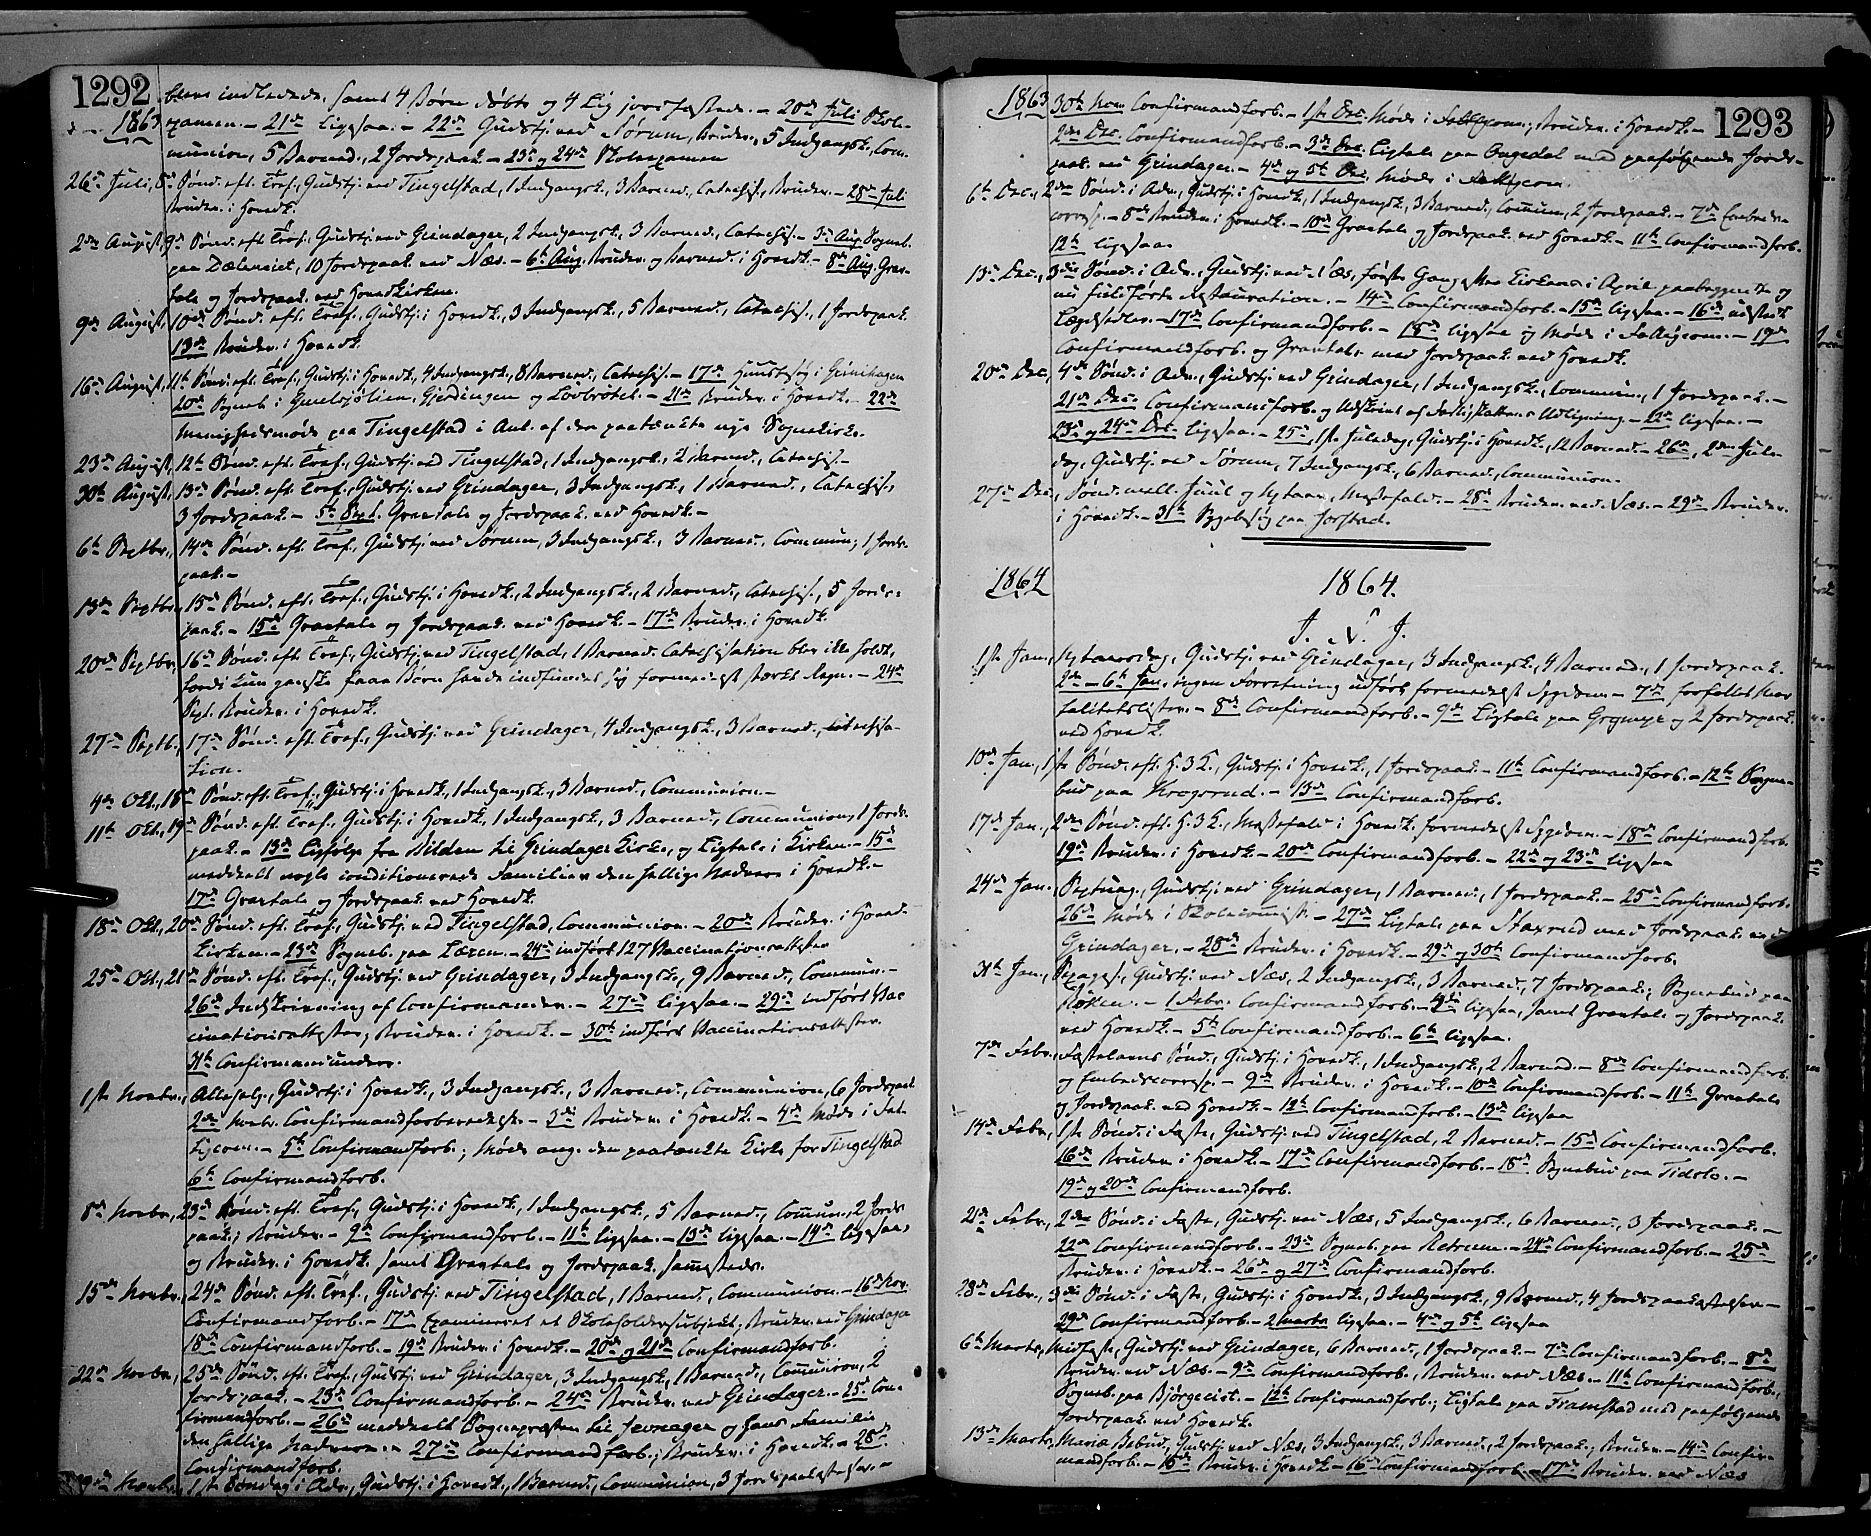 SAH, Gran prestekontor, Ministerialbok nr. 12, 1856-1874, s. 1292-1293